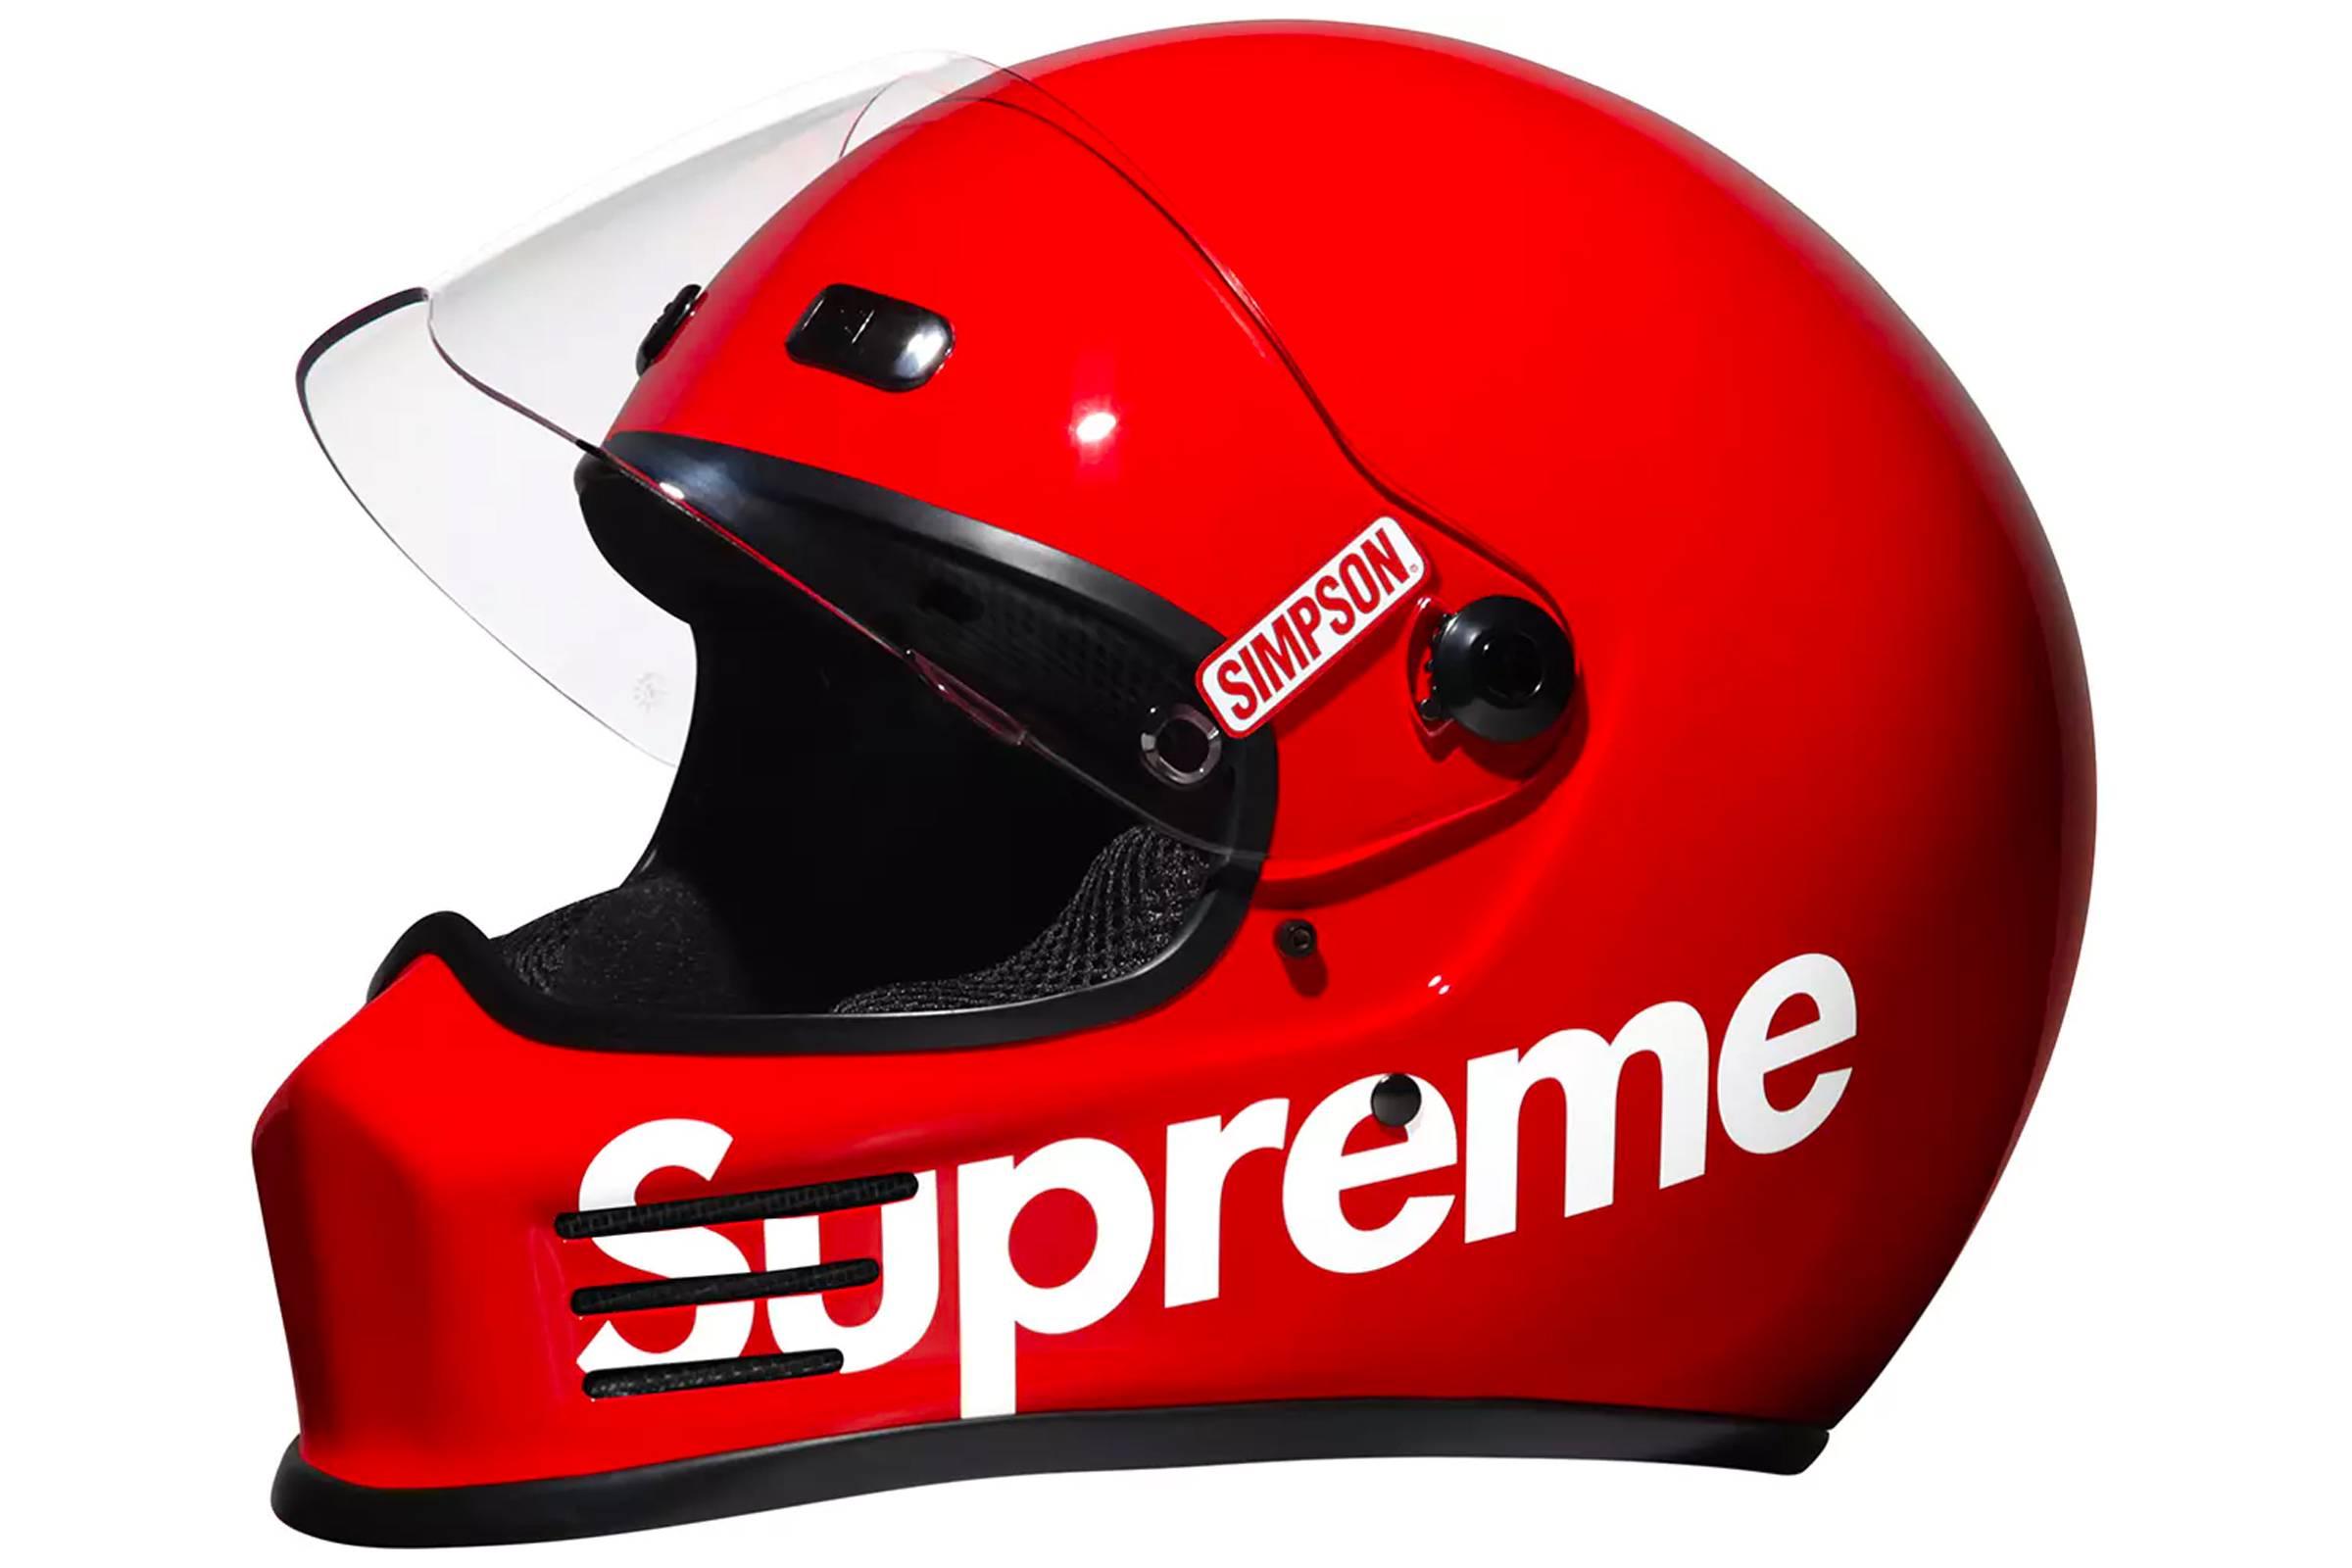 Supreme x Simpson Street Bandit Motorcycle Helmet (Fall/Winter 2016)